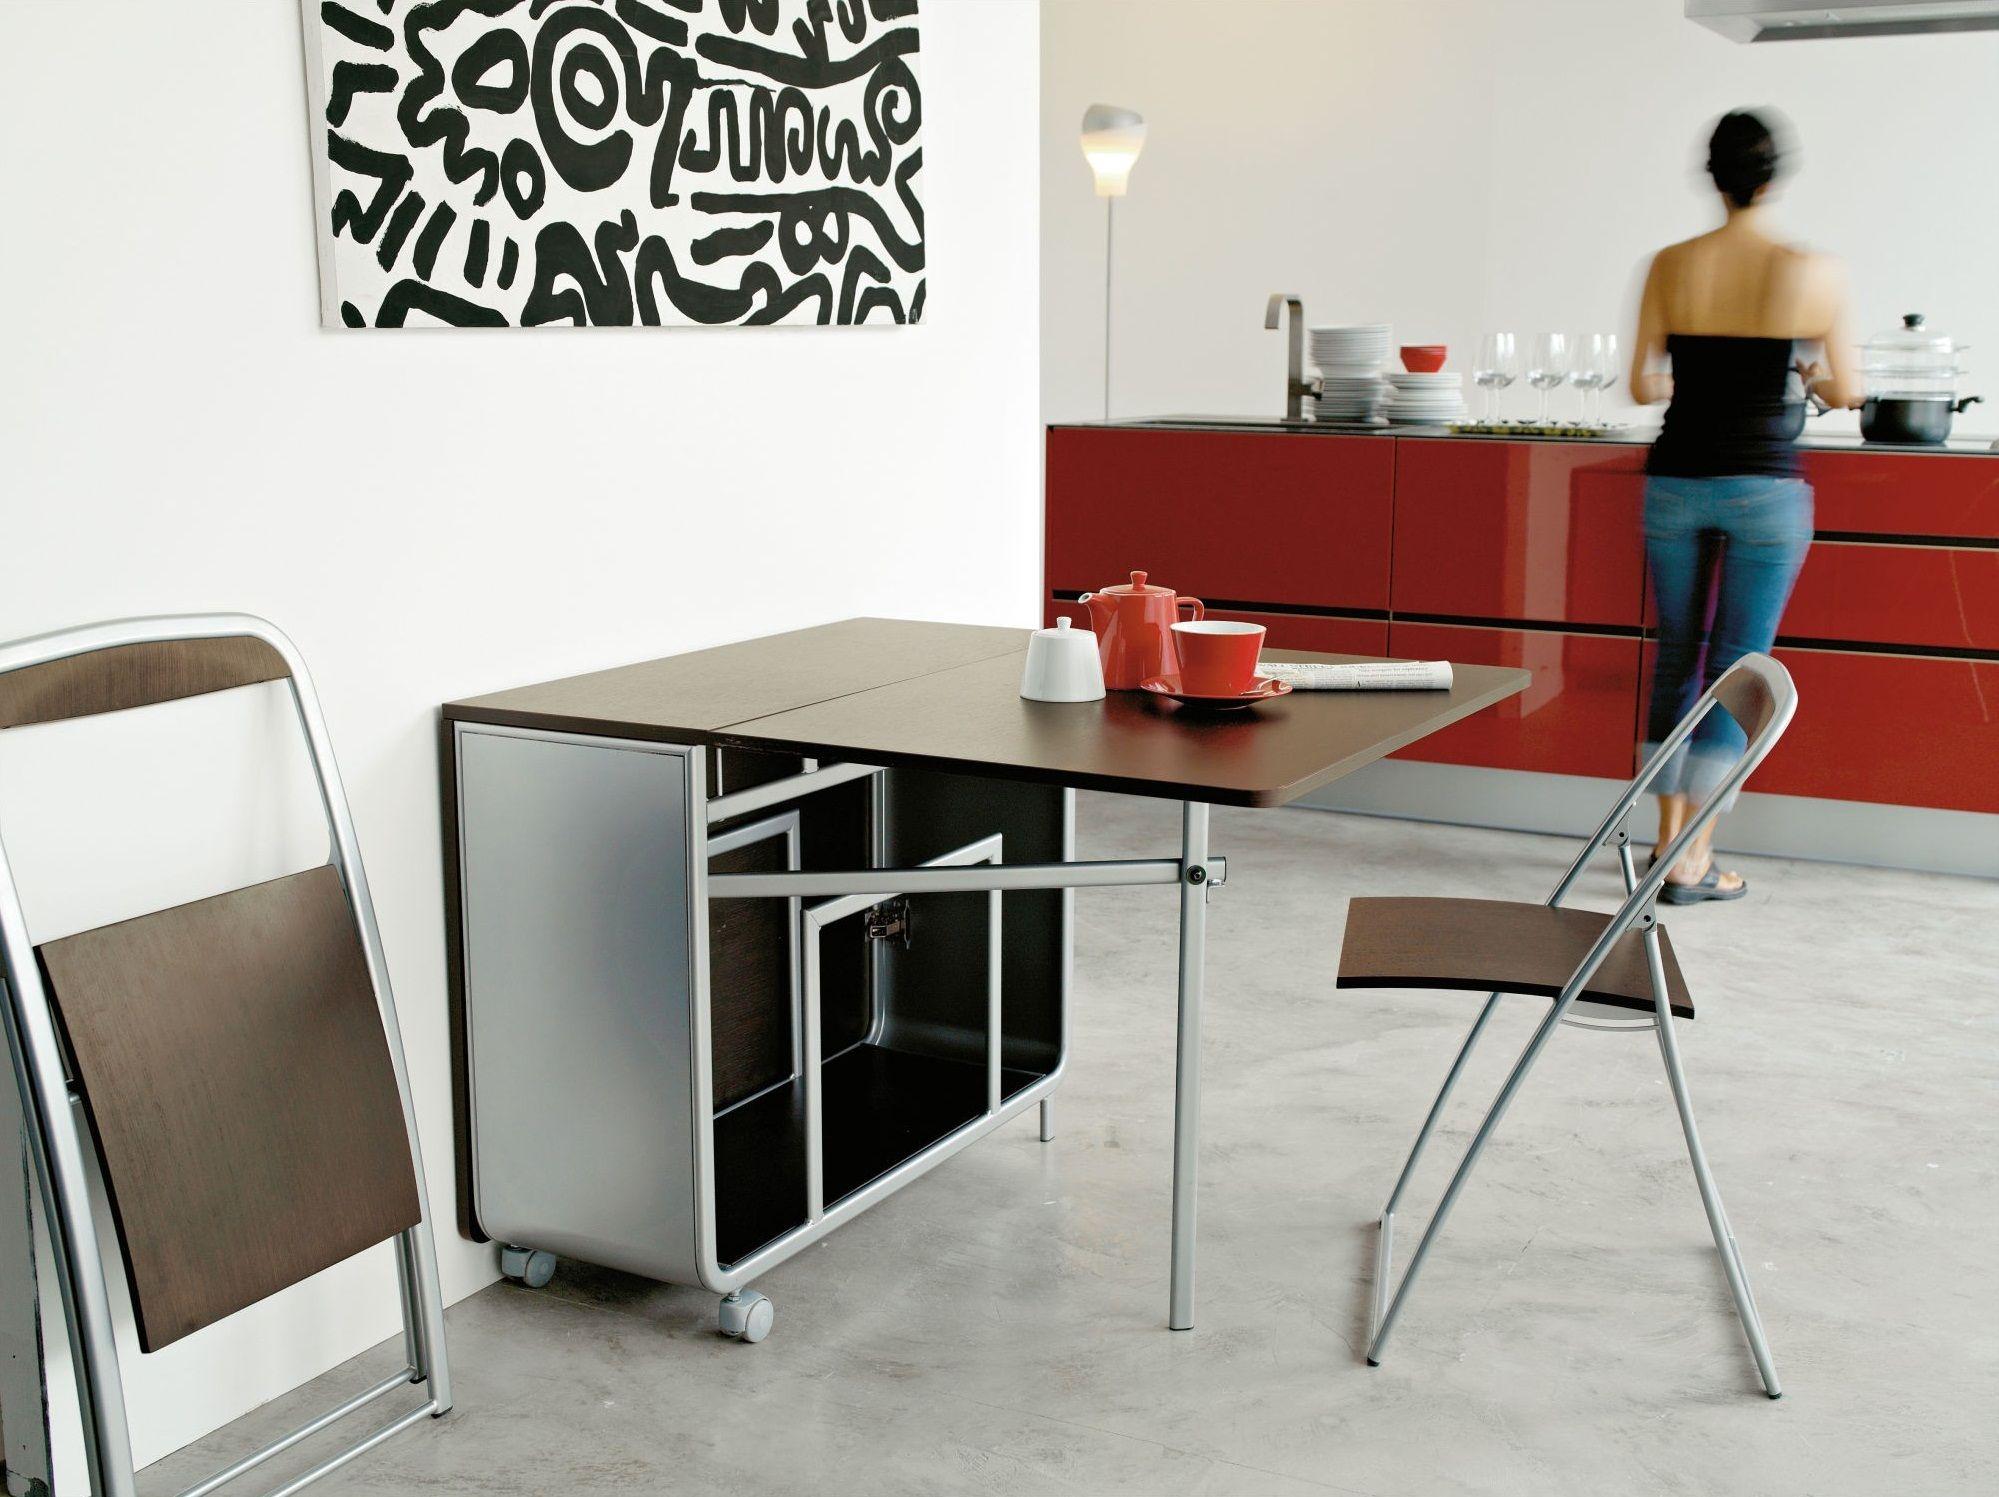 Faltbarer Tisch Mit Stuhl Speicher Mesas Dobraveis, Mesa Retrátil, Casas,  Diseño De Mesas